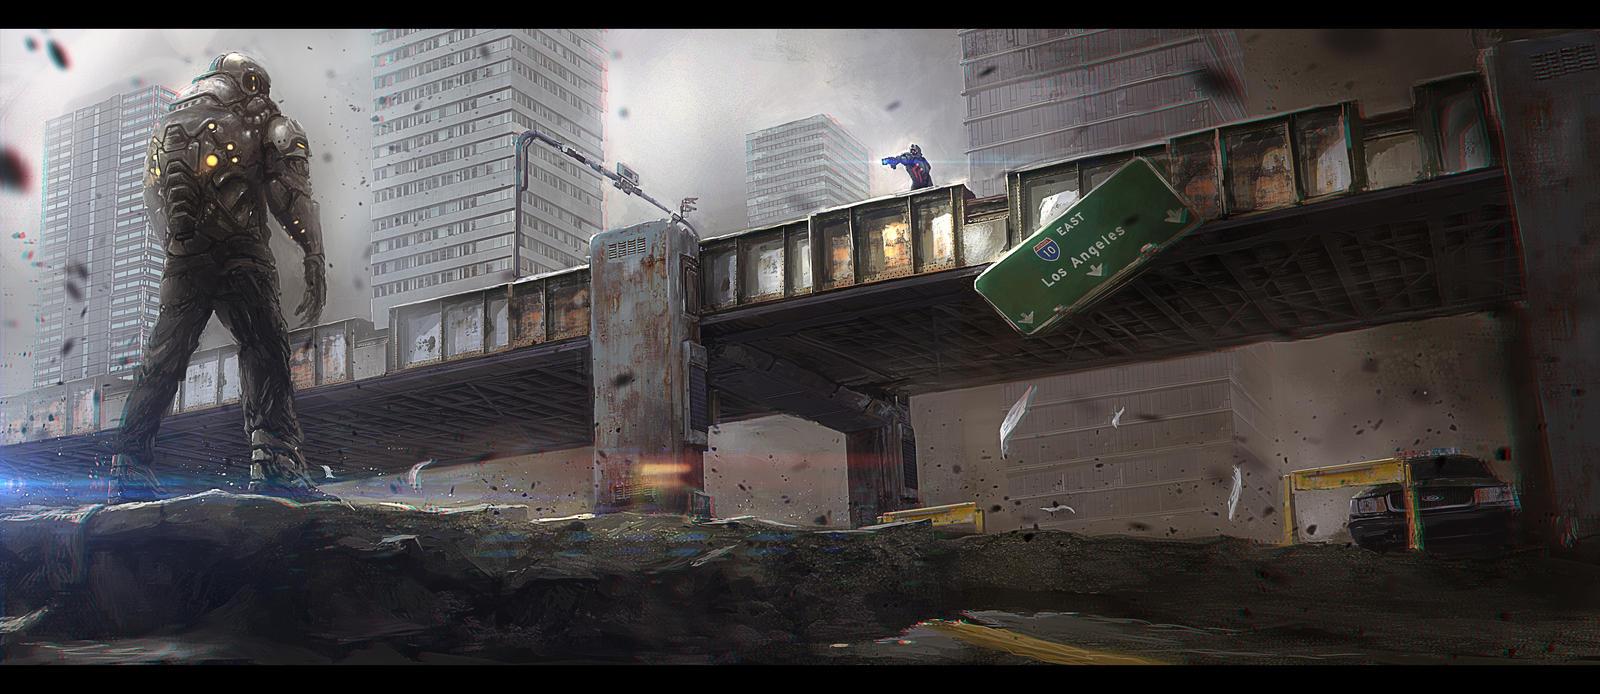 Concept Art: Aftermath by ESPj-o